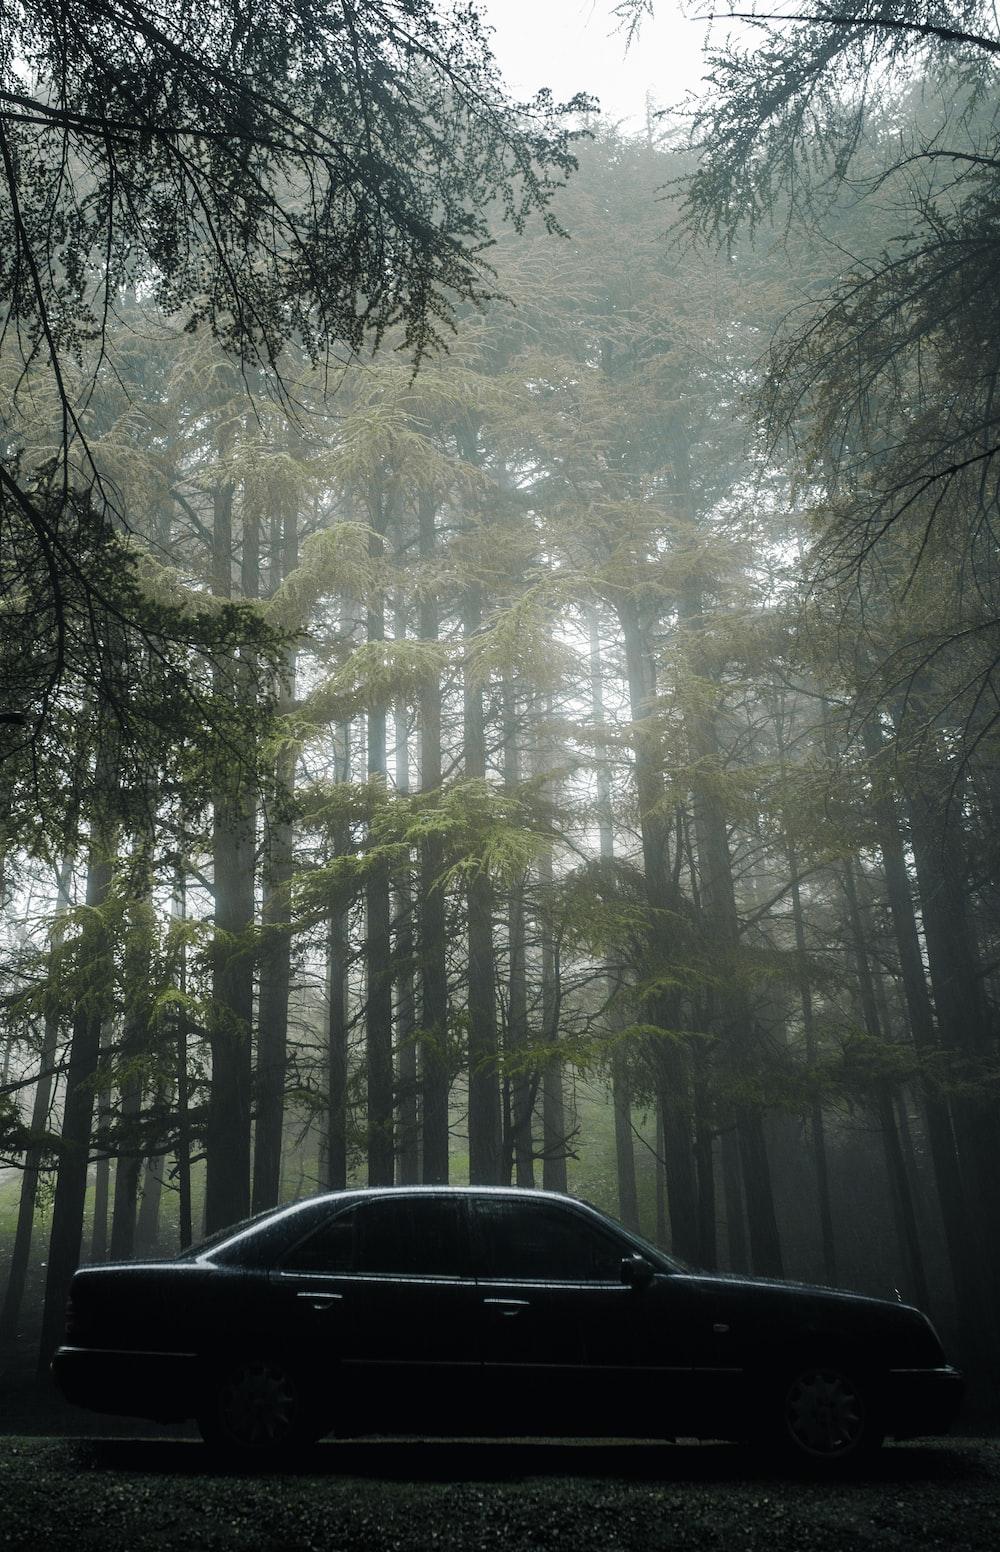 black sedan beside trees